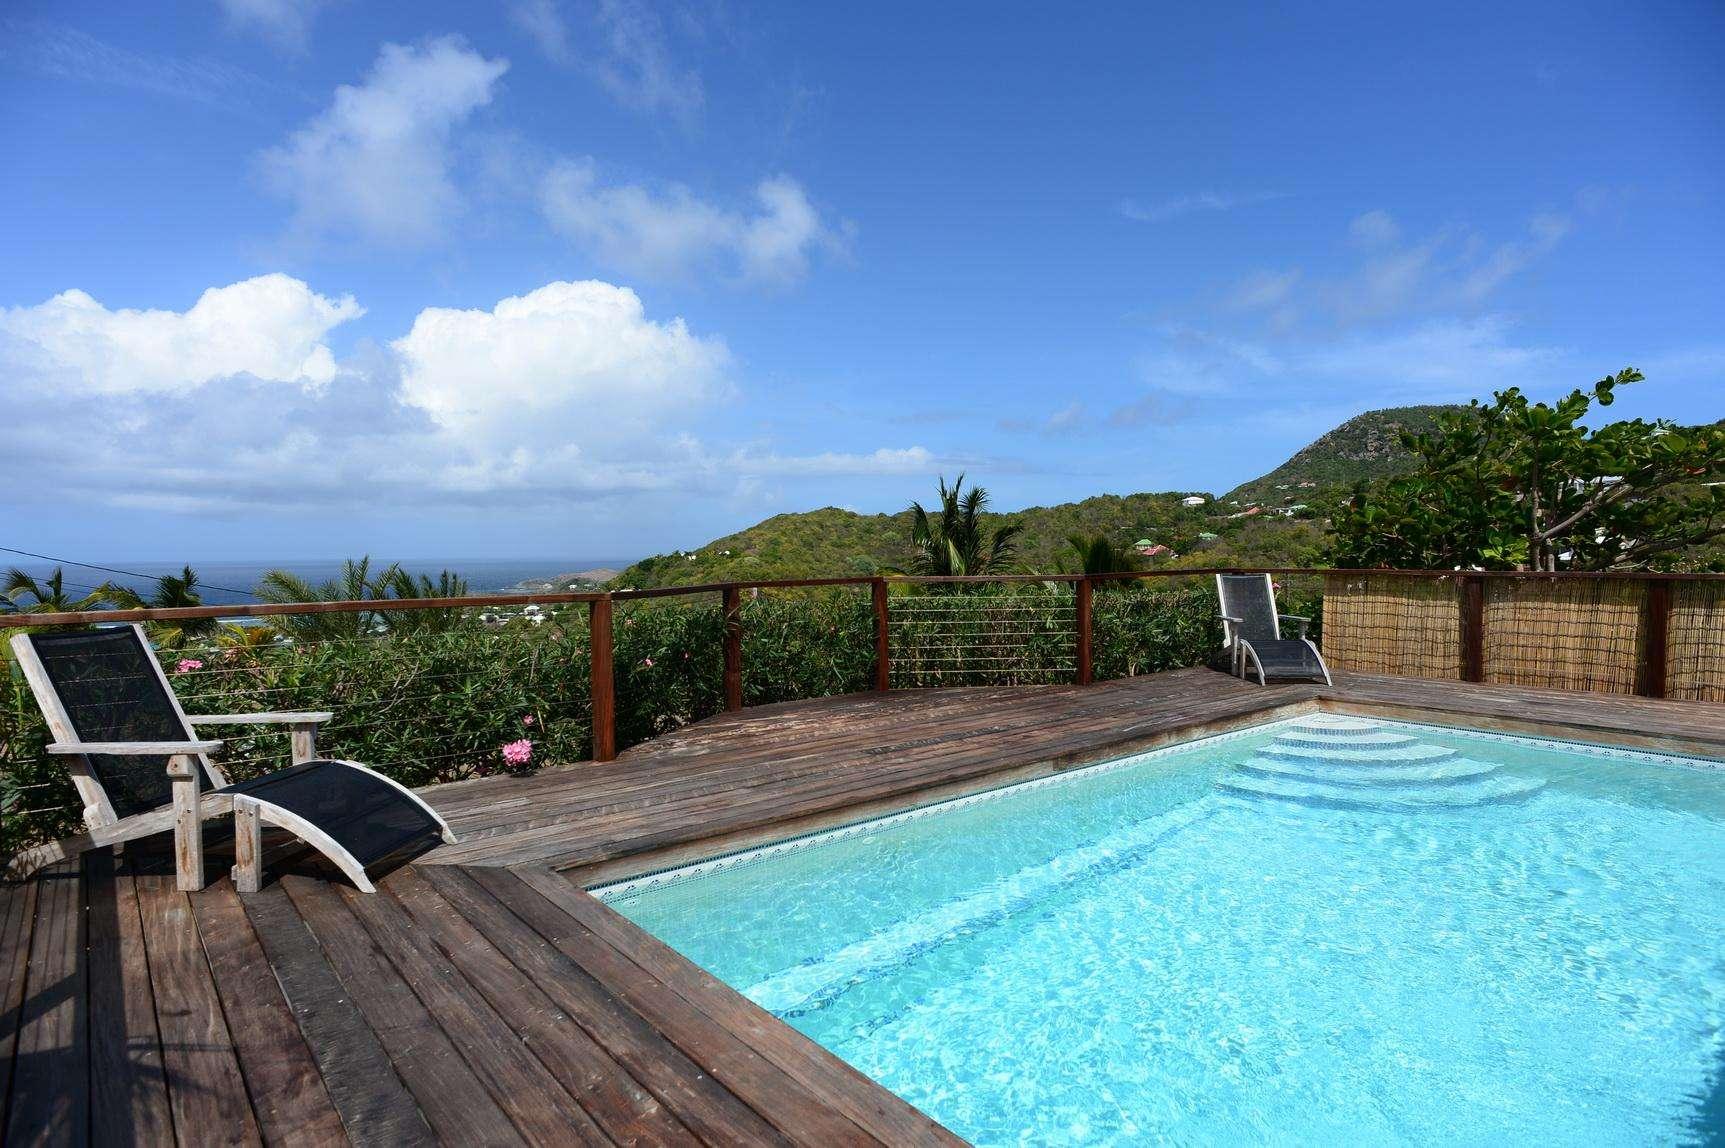 Luxury villa rentals caribbean - St barthelemy - Lorient - No location 4 - Blue Horizon - Image 1/21